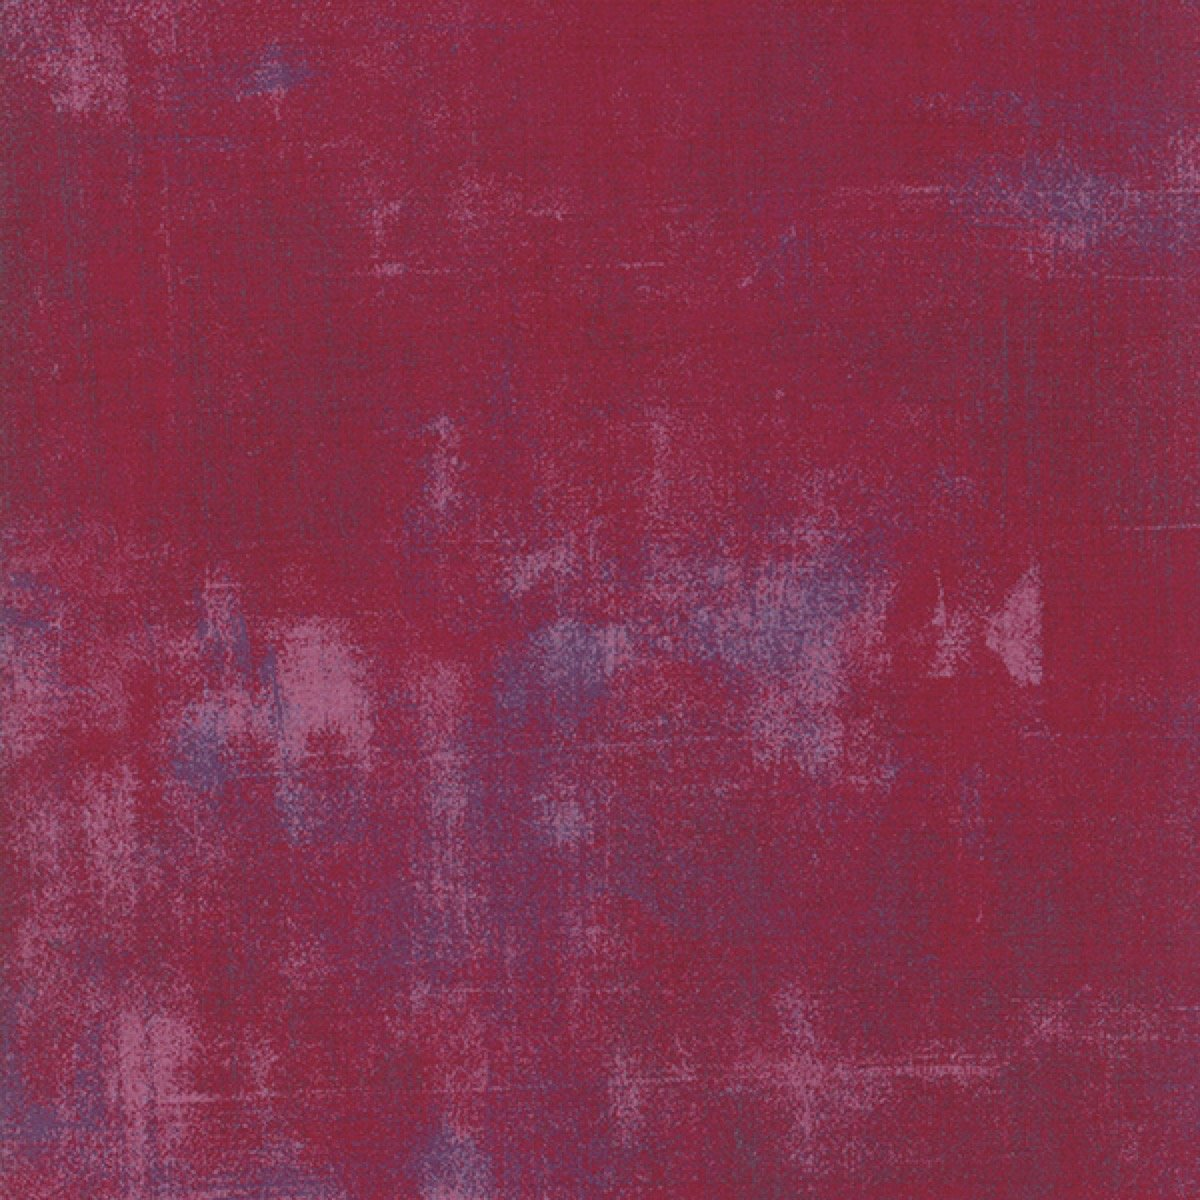 Moda Fabrics Grunge Texture New Colors 2017~ Cordovan Cotton Fabric